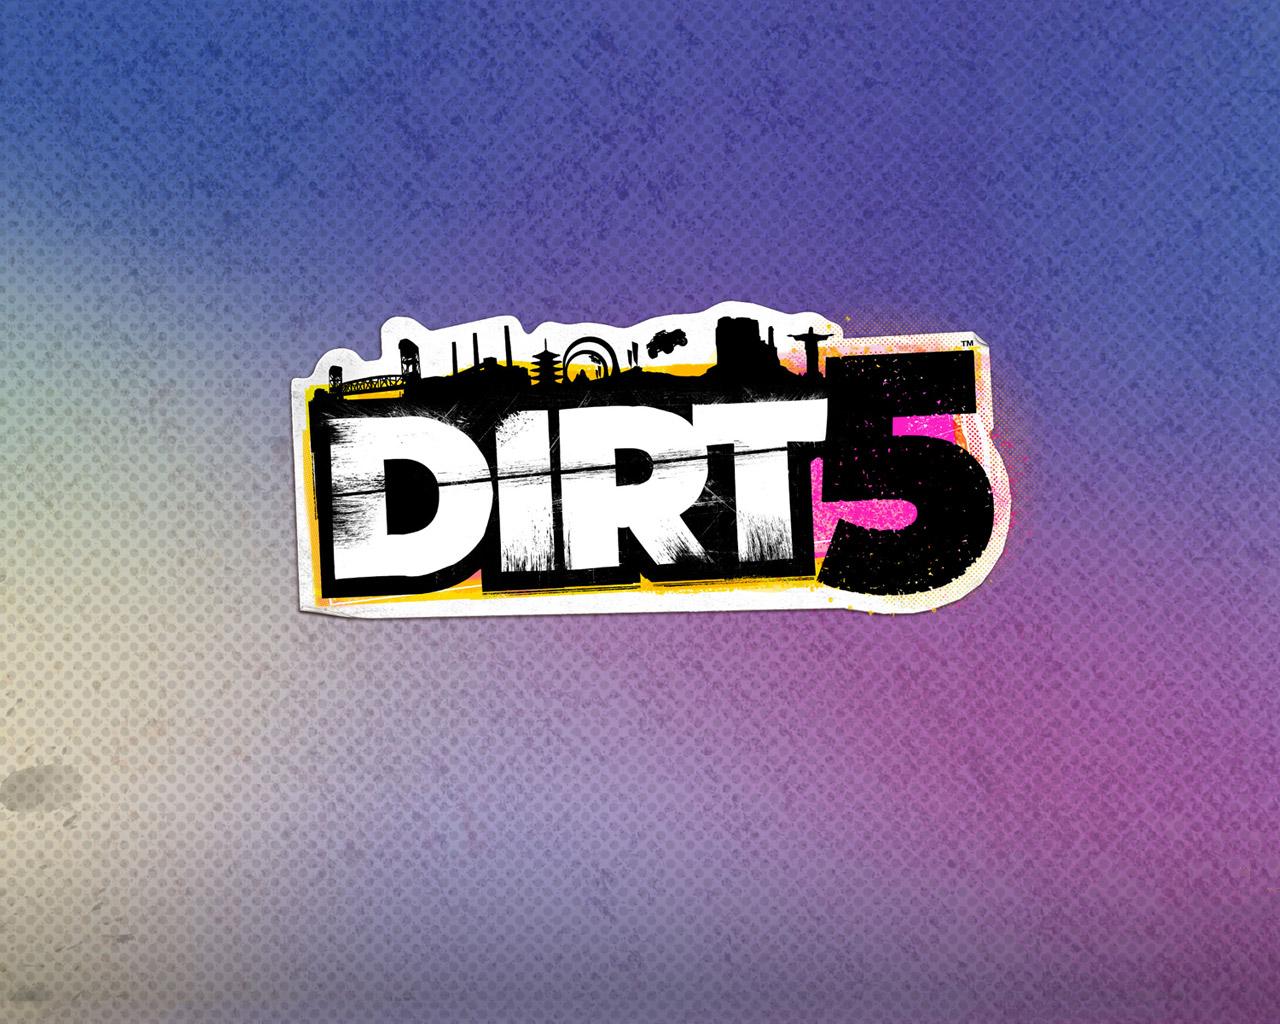 Free Dirt 5 Wallpaper in 1280x1024